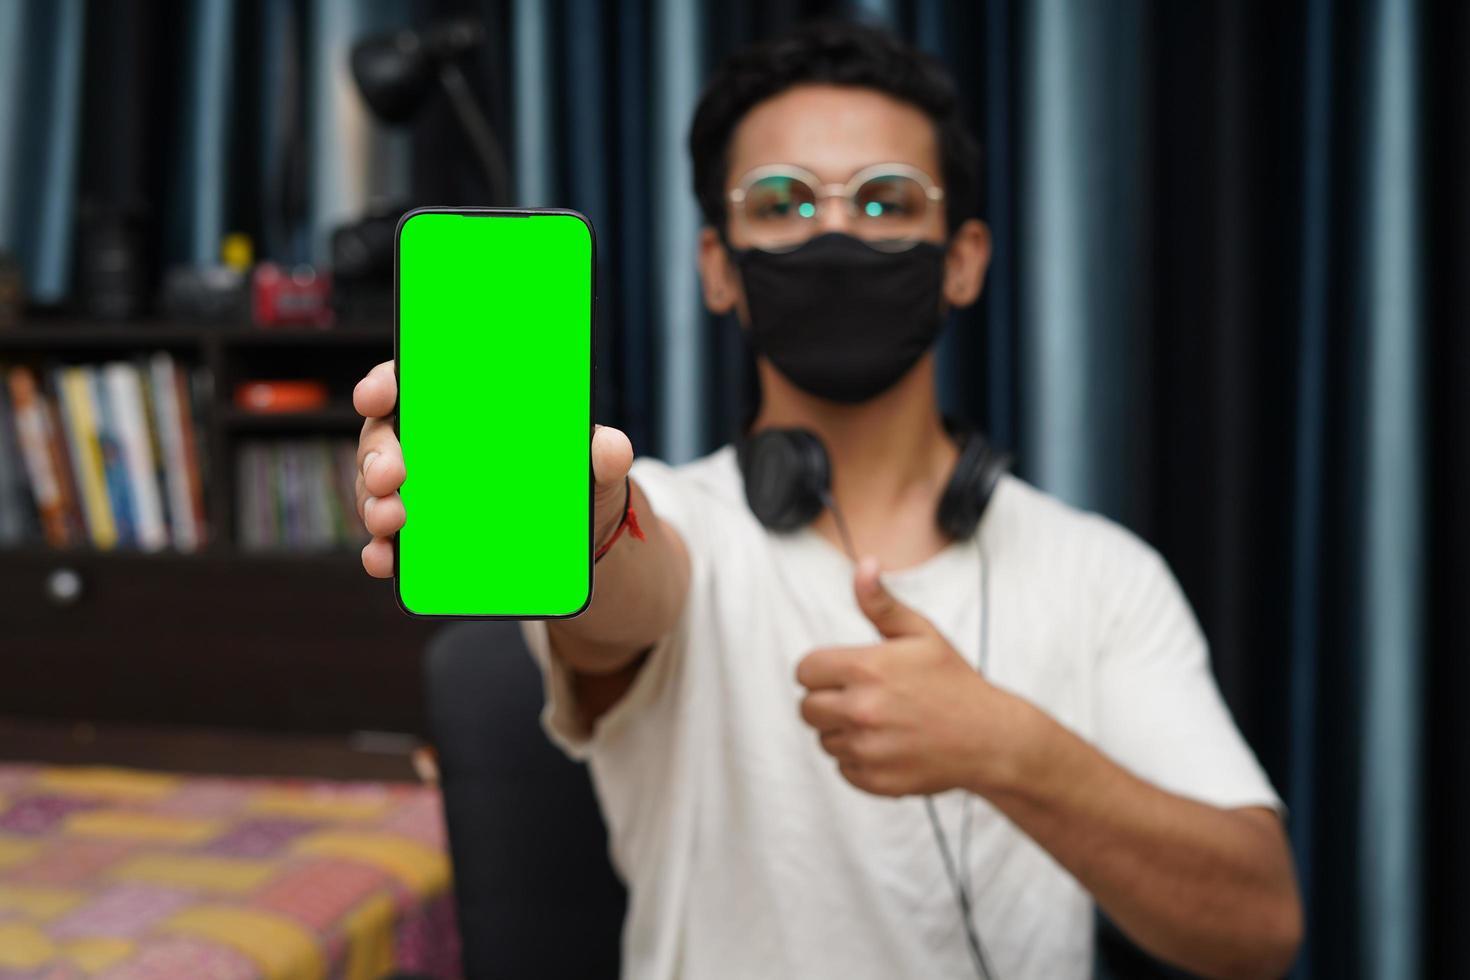 ung indisk pojke som håller en telefon med grön skärm foto